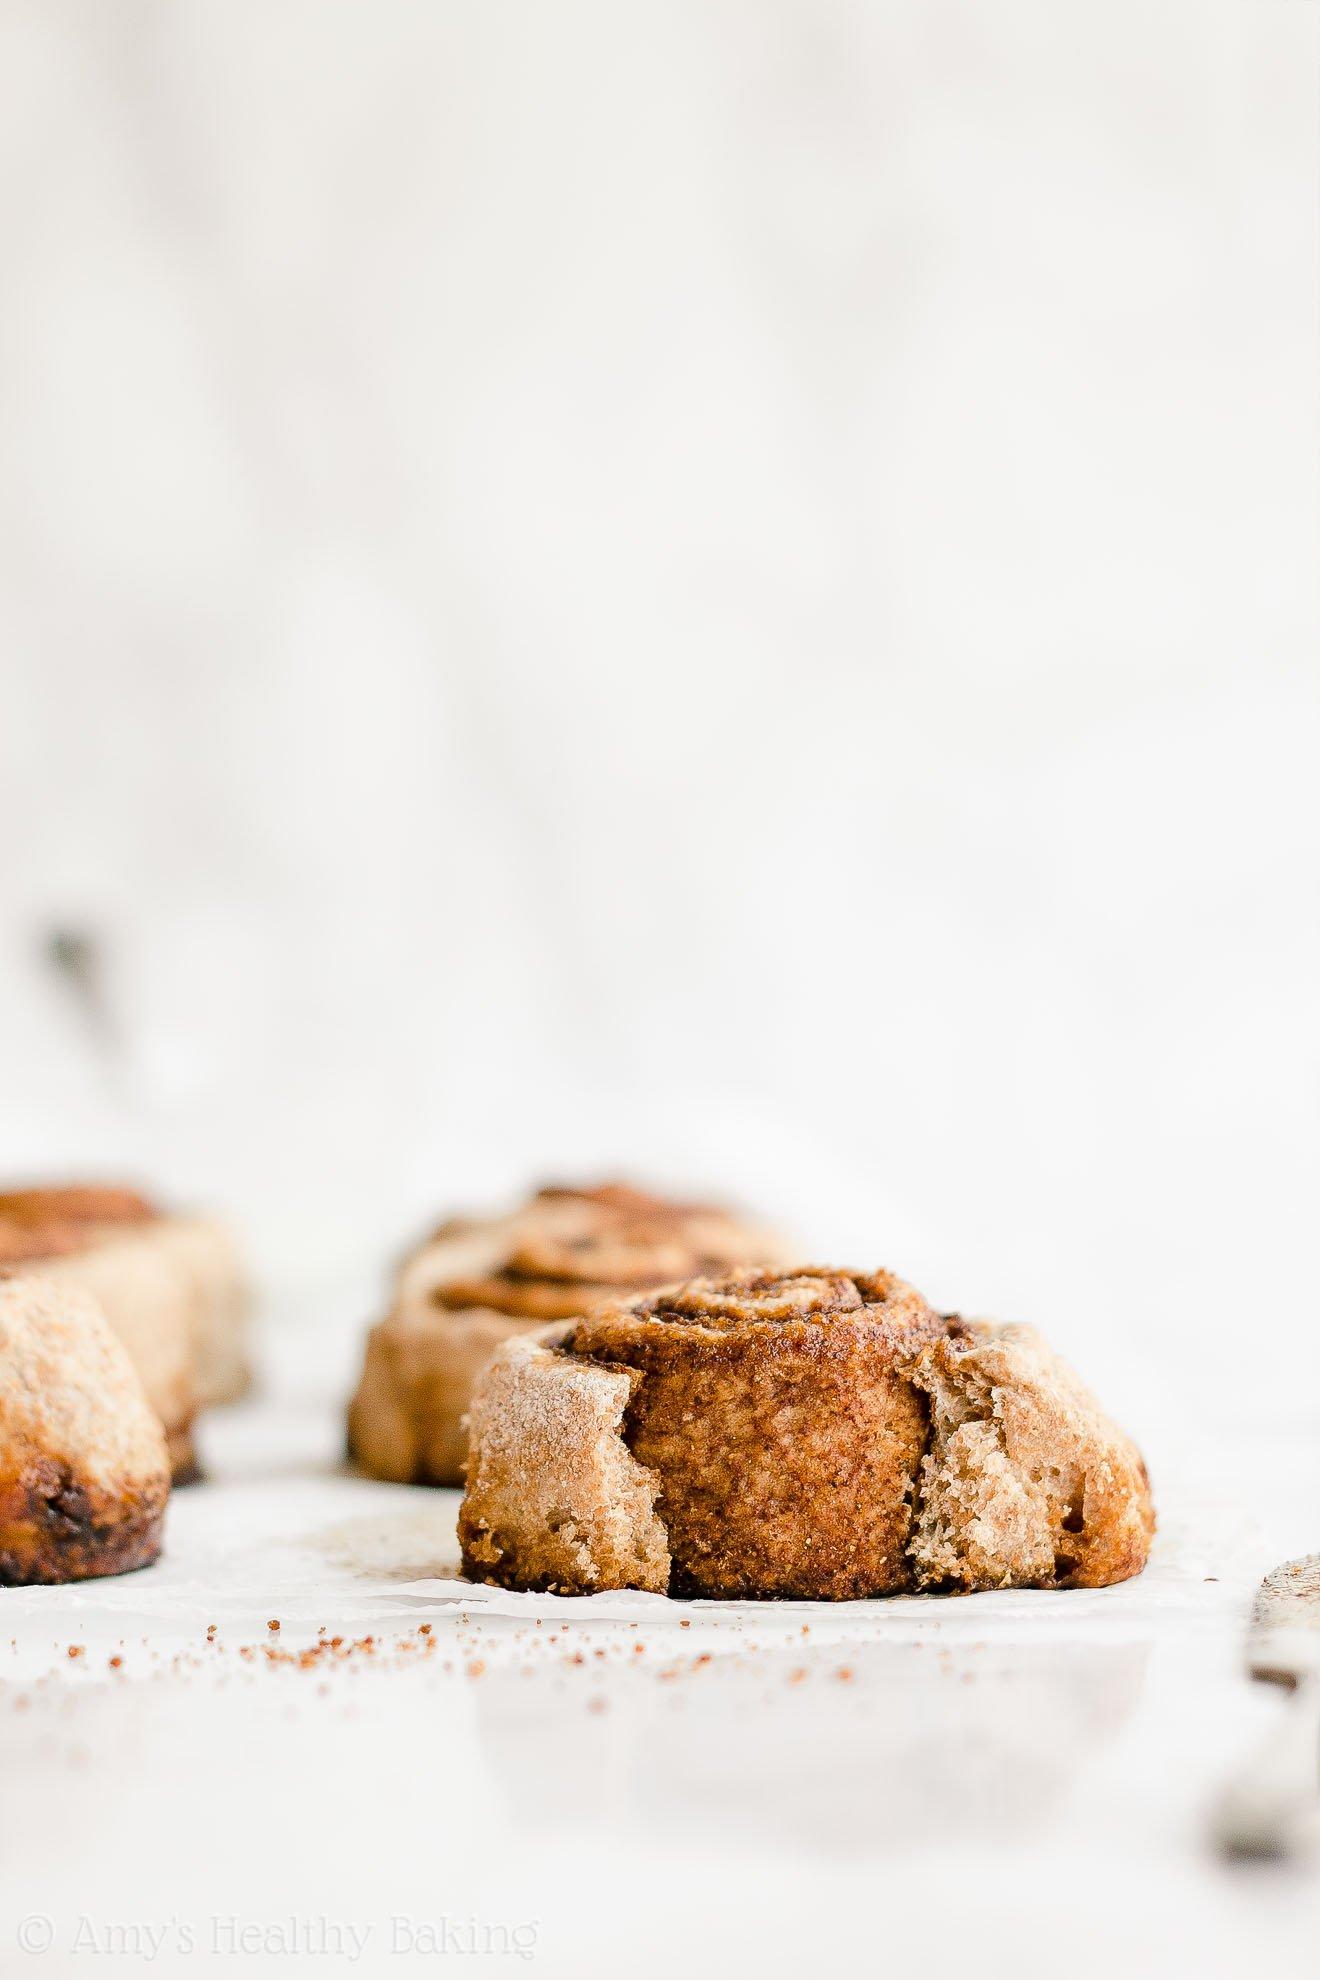 Healthy Low Calorie Whole Wheat Vegan Chai Spice Cinnamon Rolls